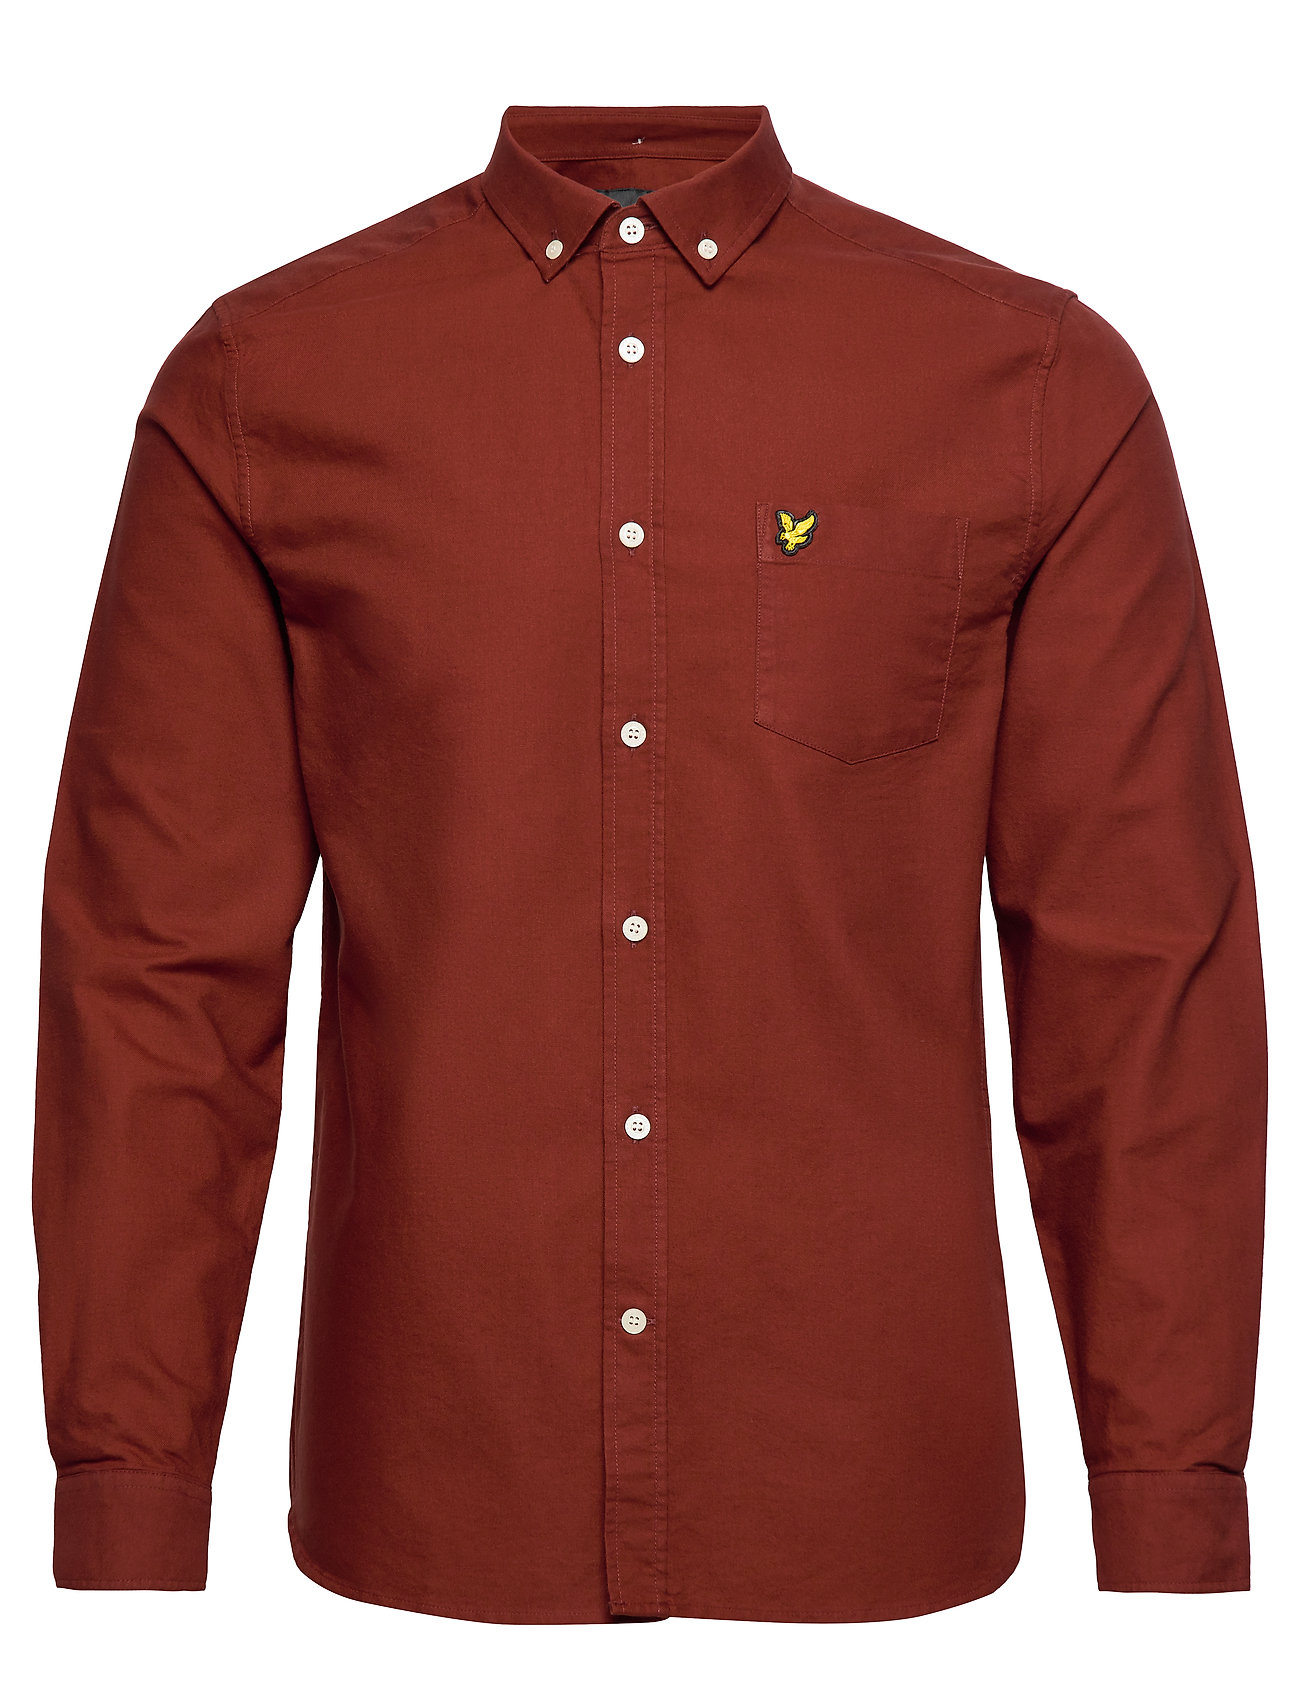 Lyle & Scott Oxford Shirt - BRICK RED